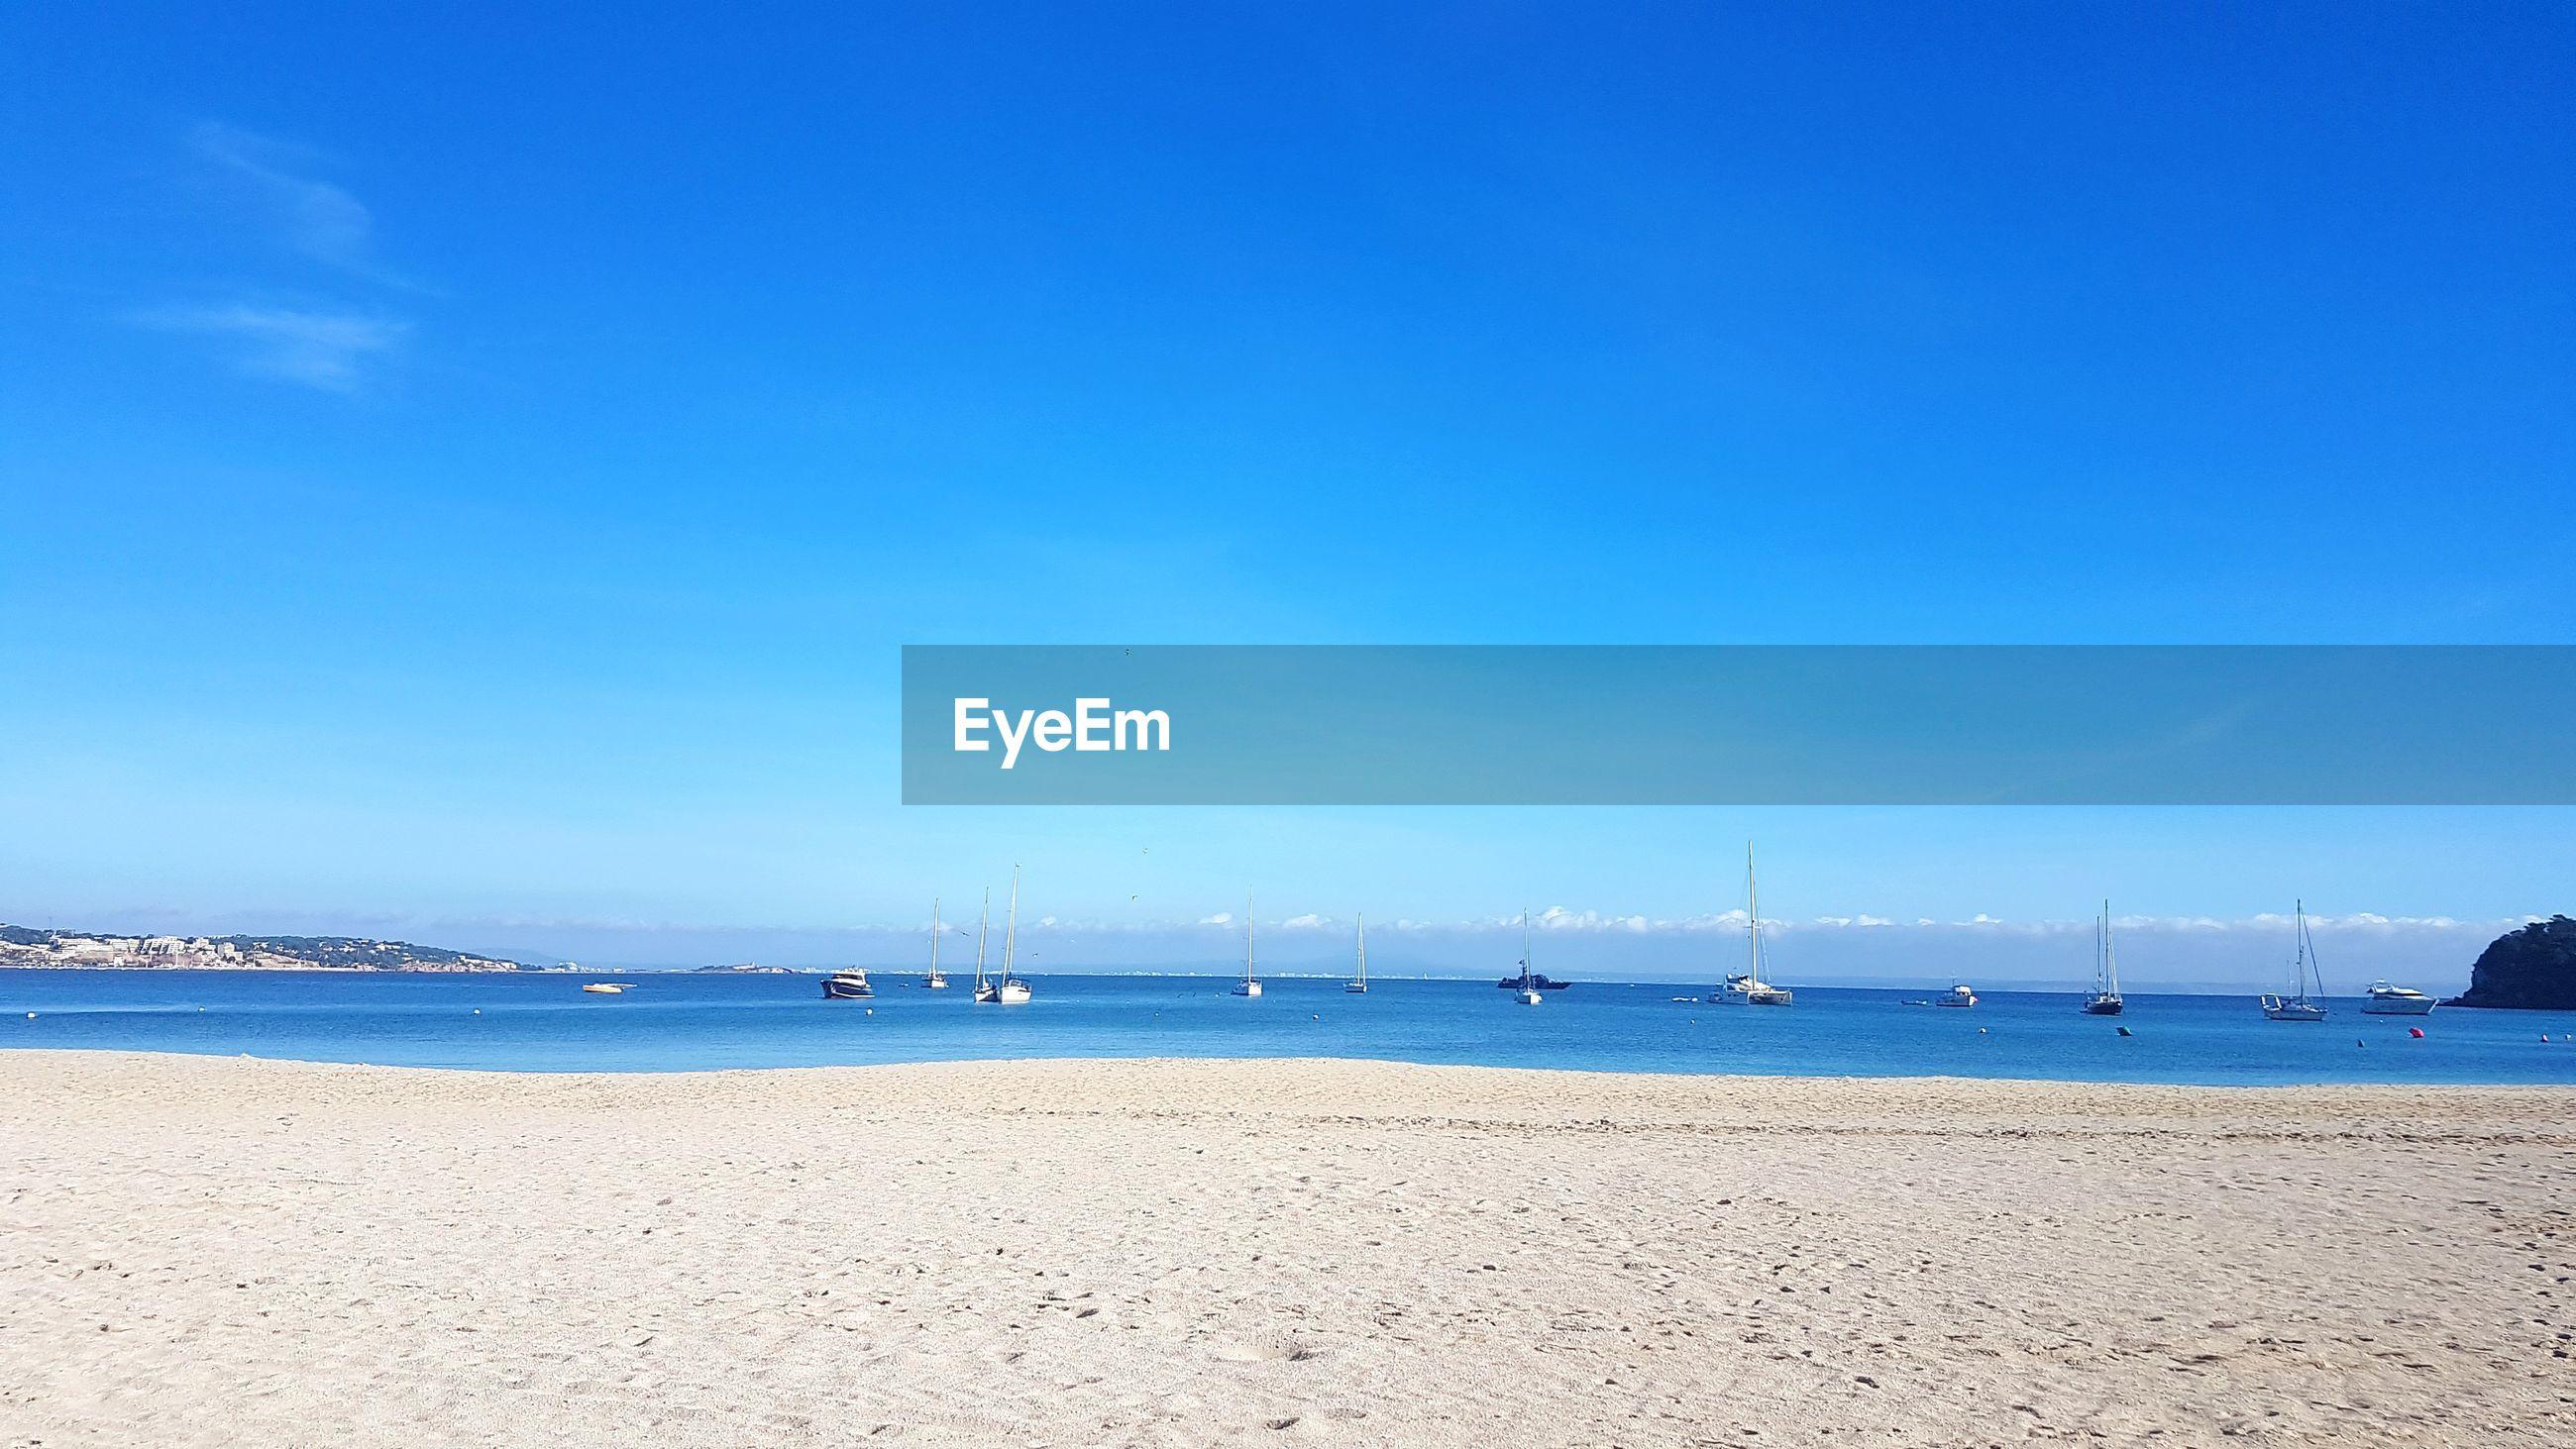 SAILBOATS ON SEA AGAINST BLUE SKY